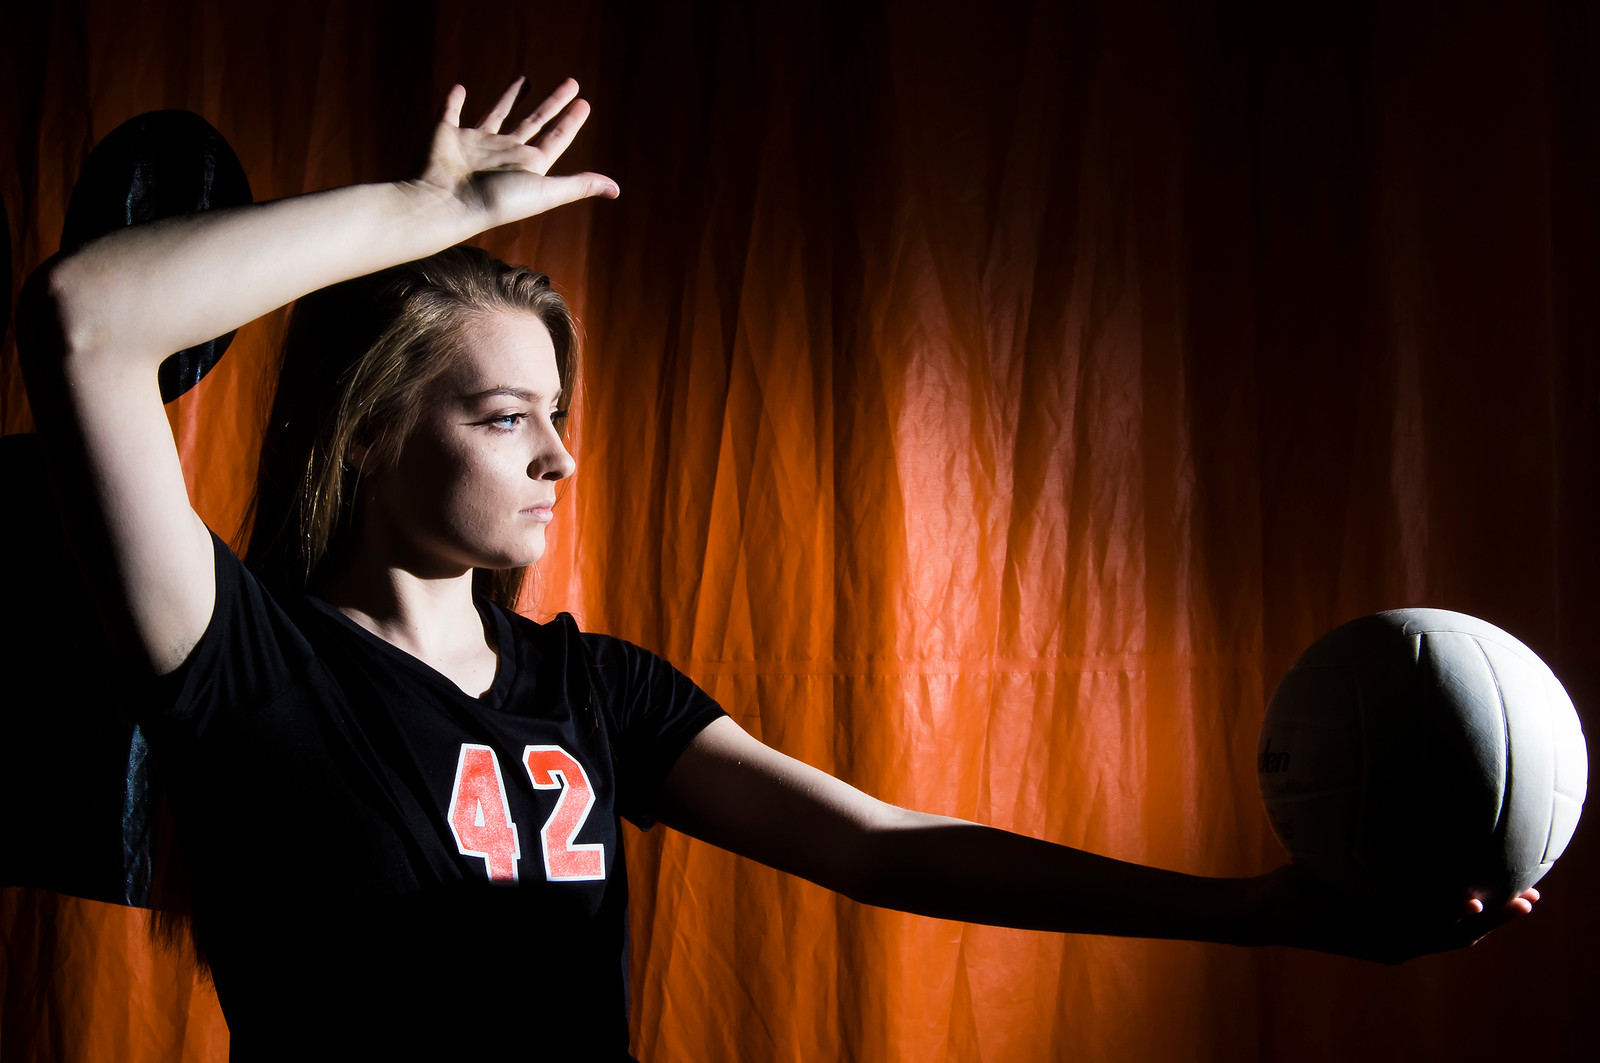 hspts_adv_AOY_Volley_Megan_Kelly_01.jpg